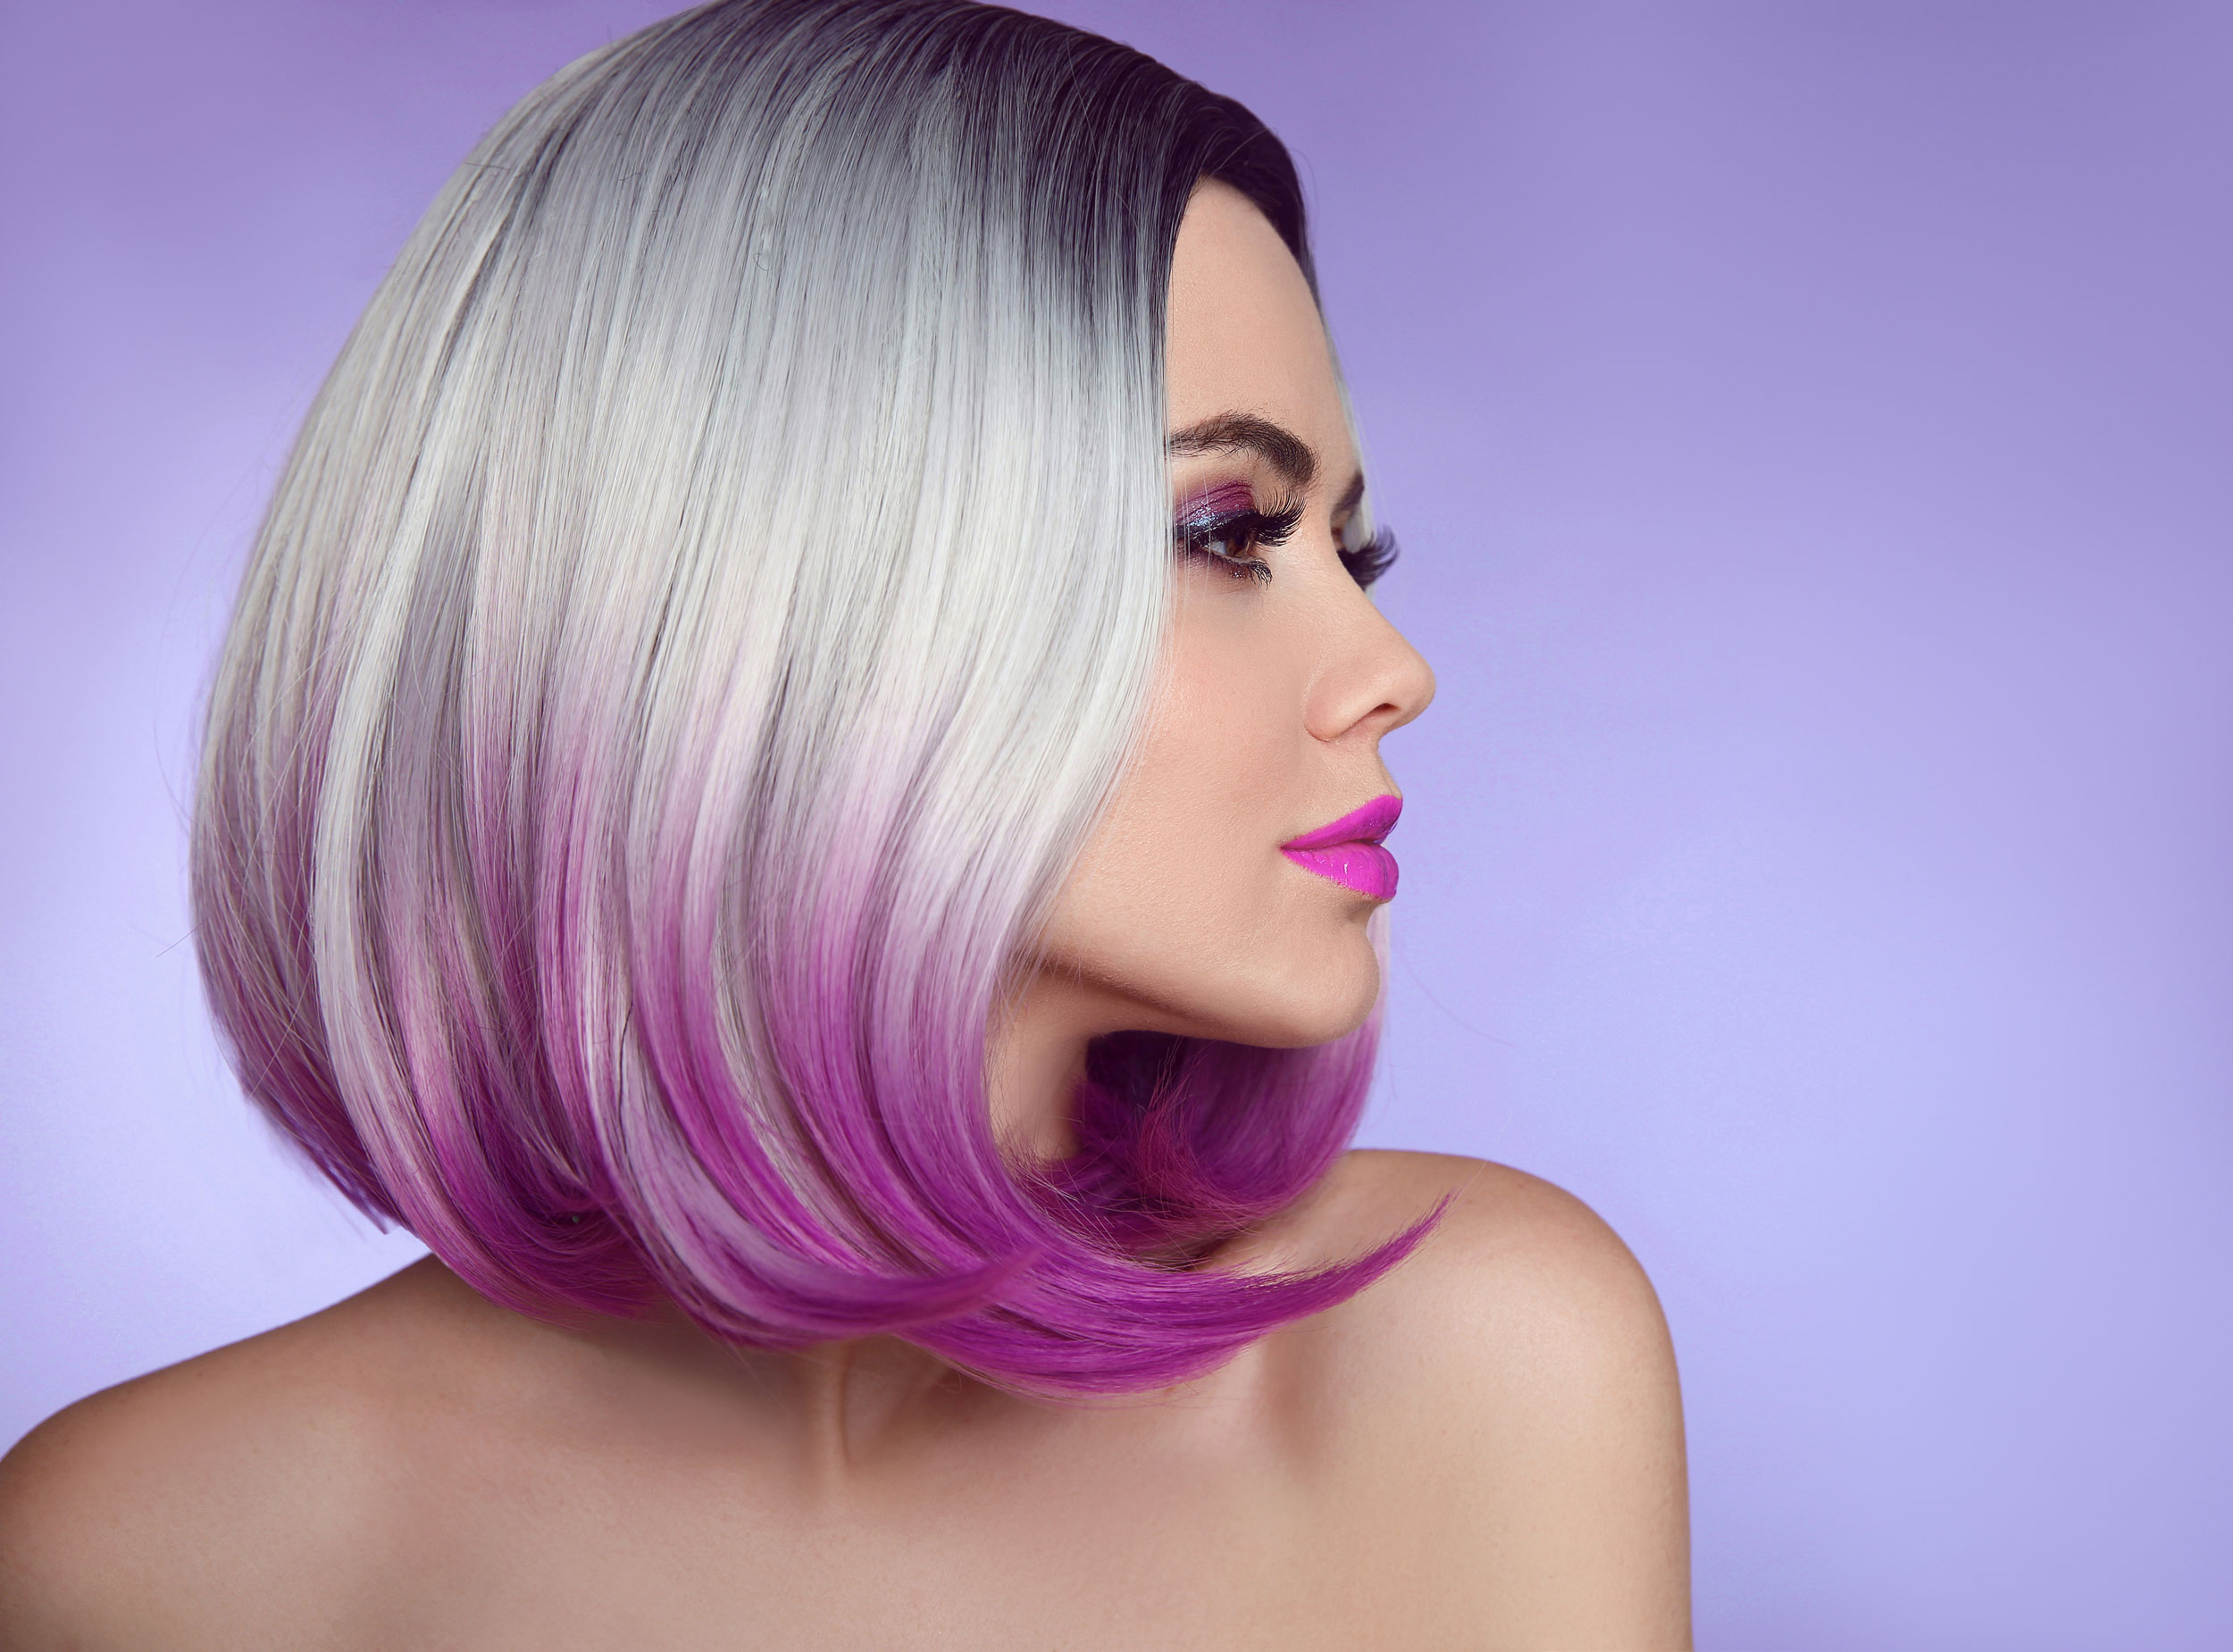 Caffieros Hair Design